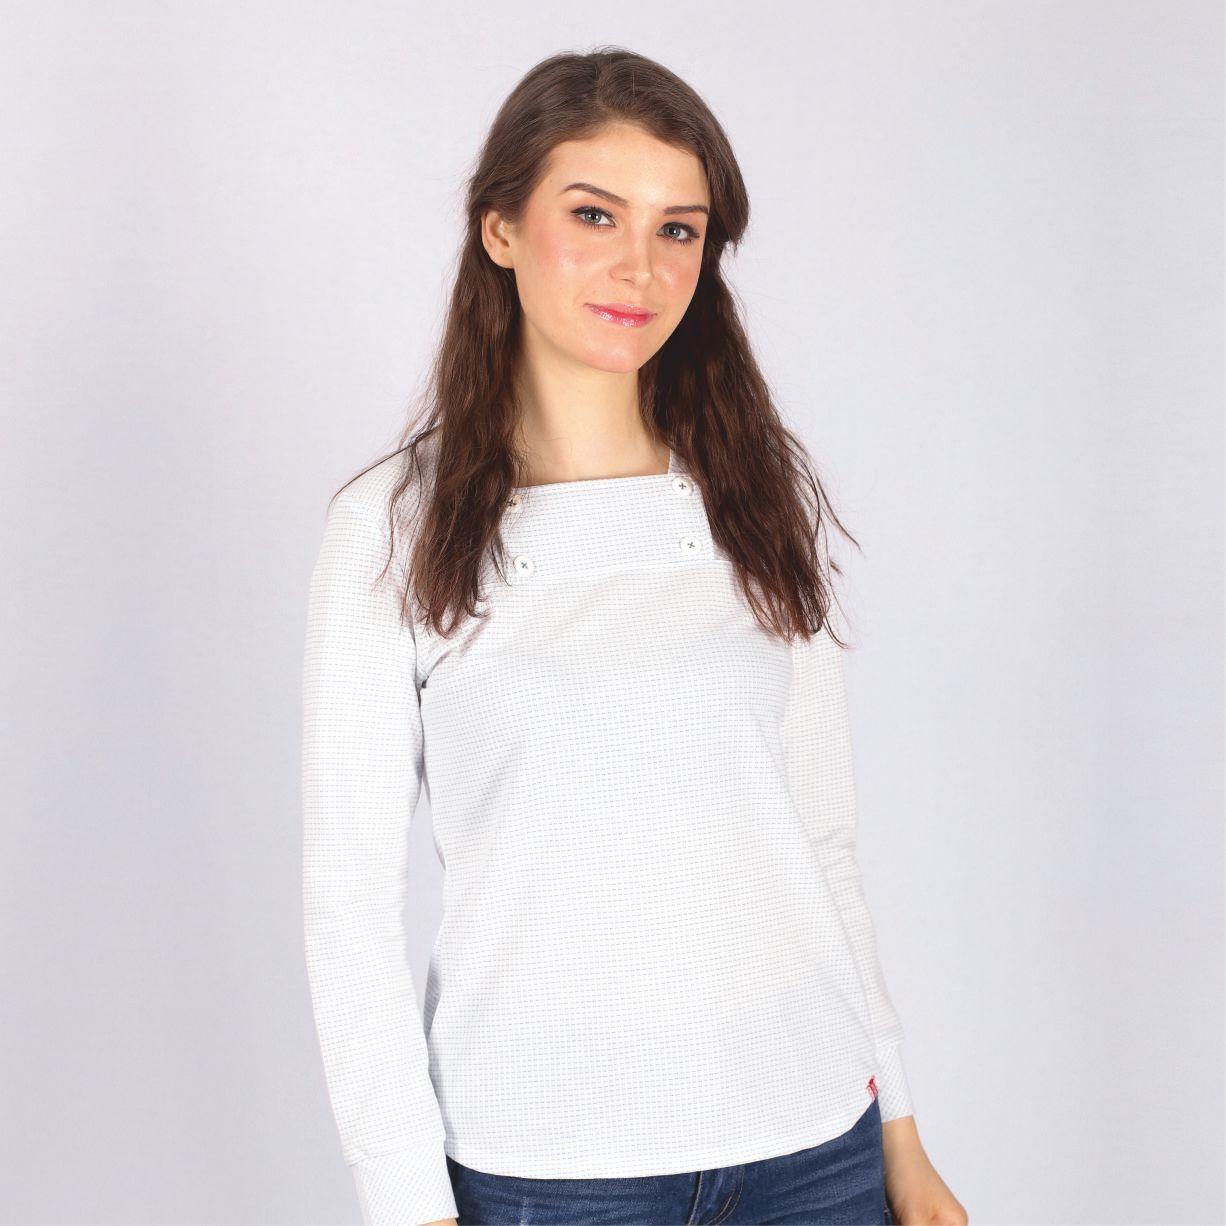 Cressida Baju Cewe Femme - HRKP.882220